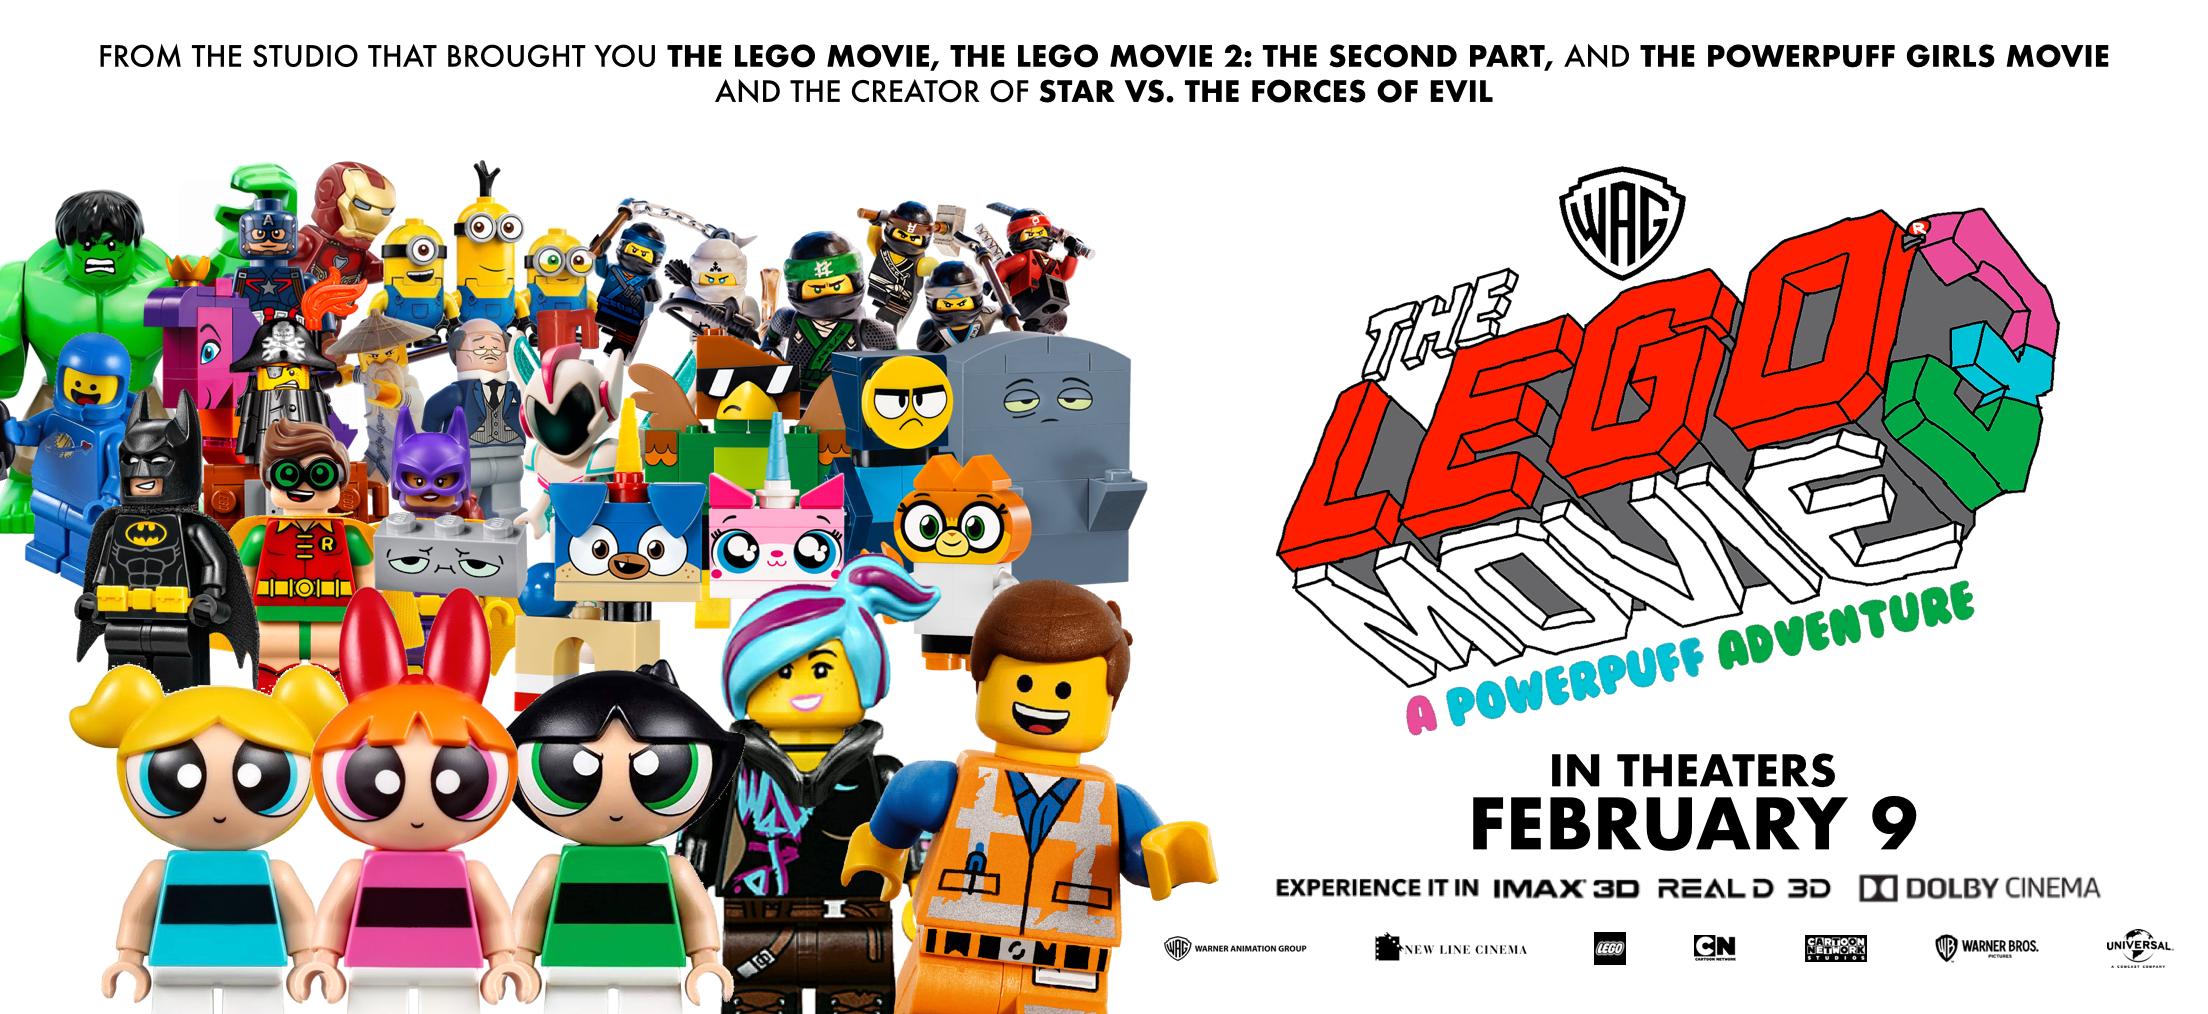 The Lego Movie 3 A Powerpuff Adventure Fandom